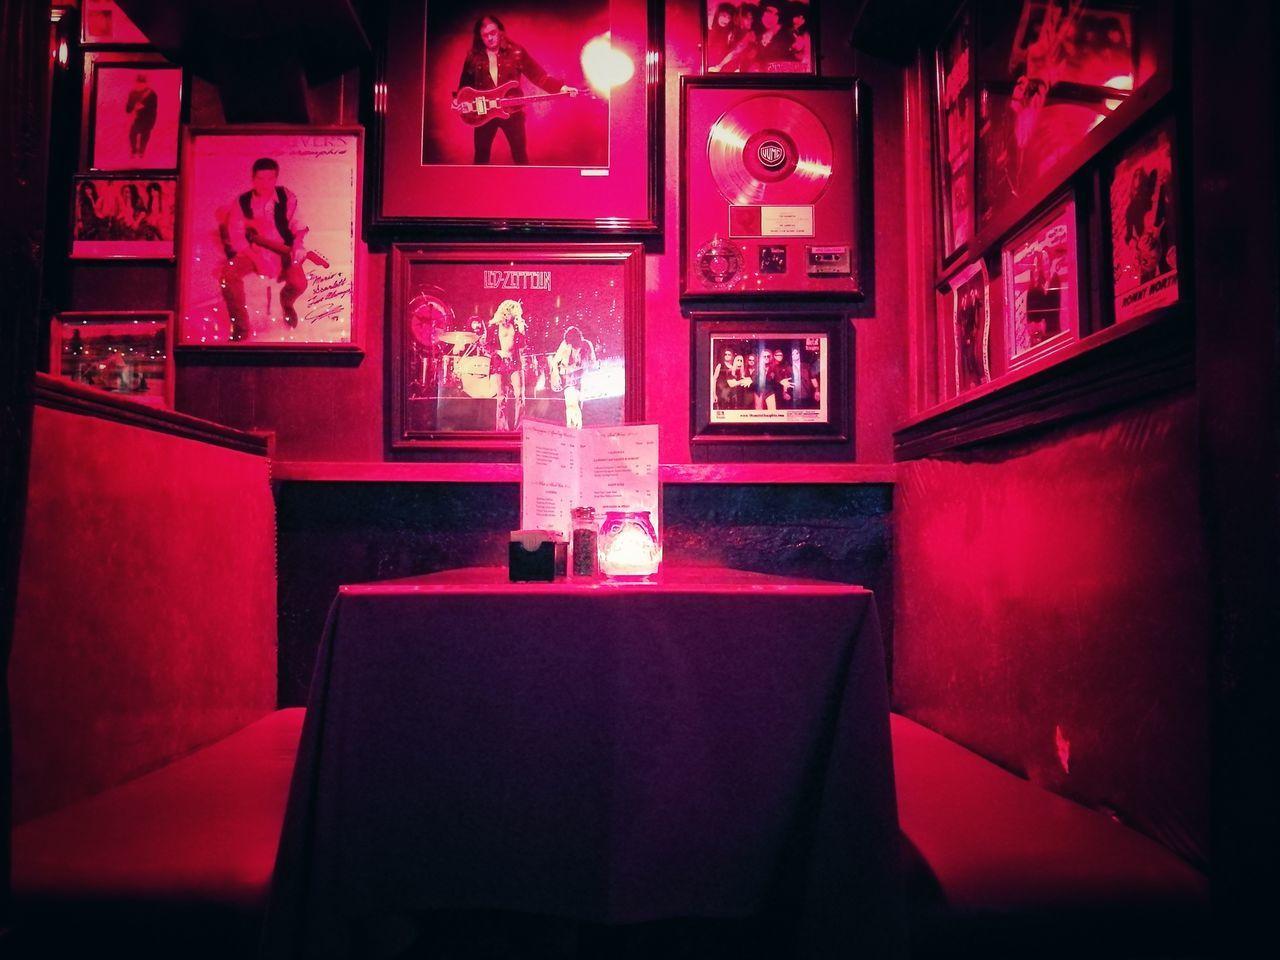 Rainbow Losangeles Cheers LemmyKilmister Nightlife Red Indoors  No People Westhollywood Food And Drink